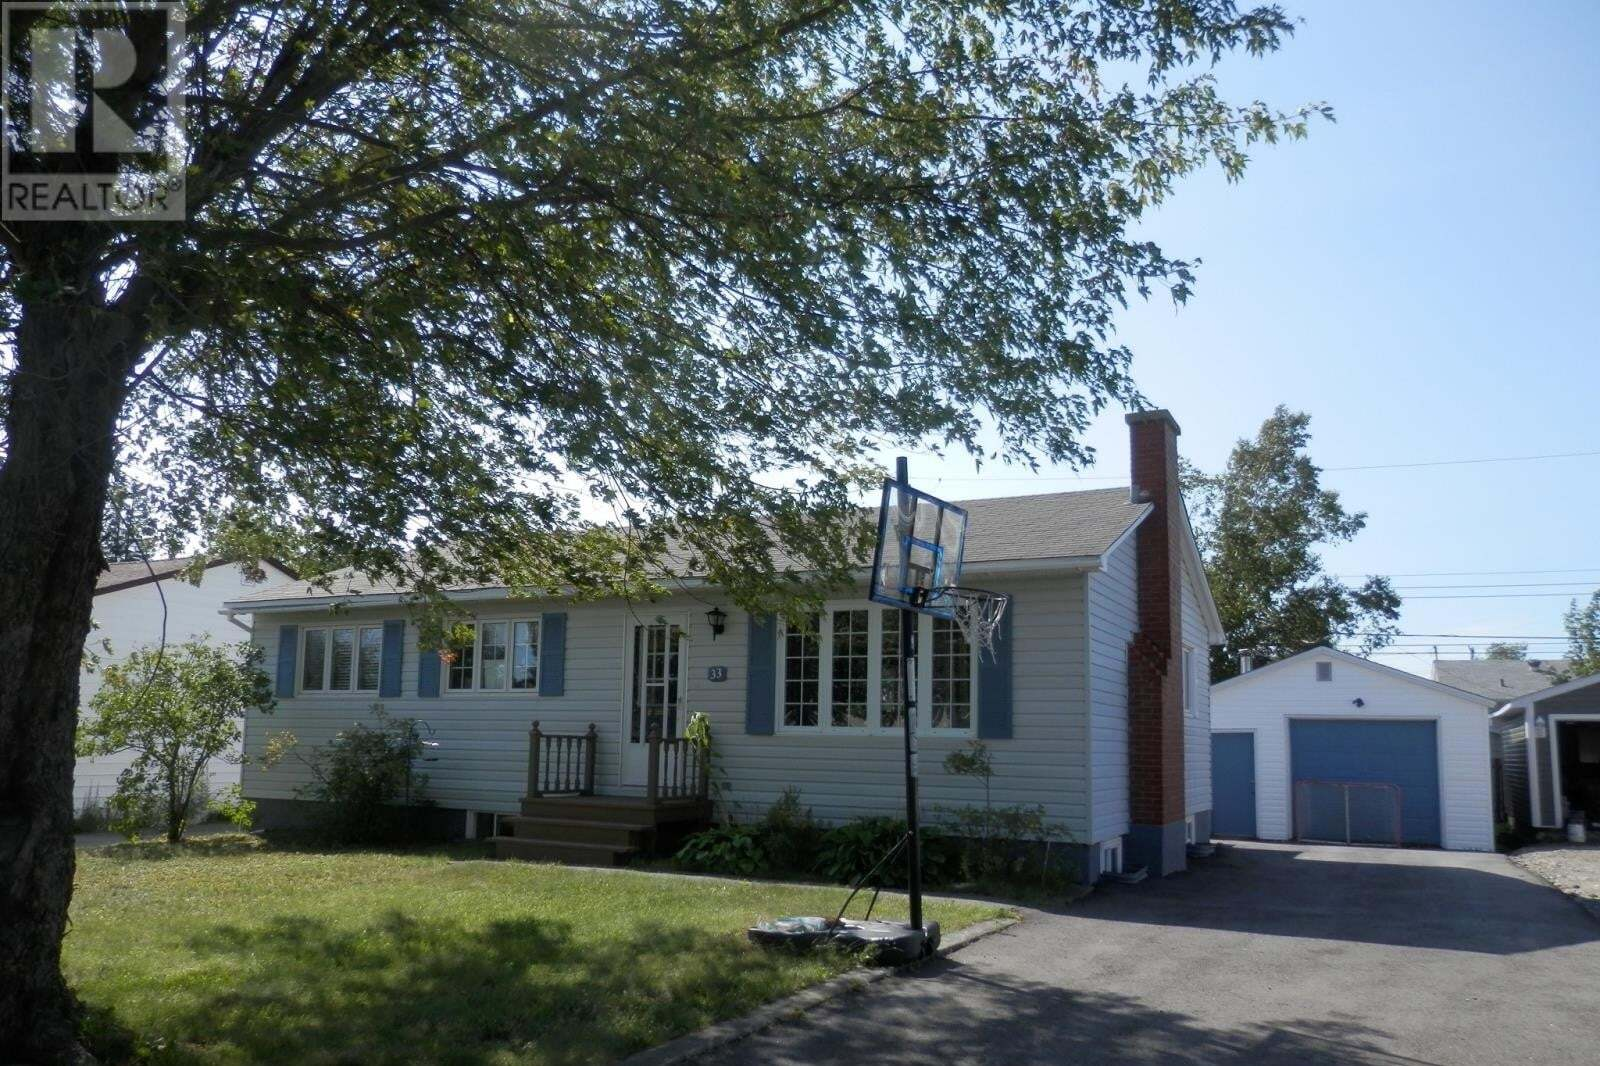 House for sale at 33 Earhart St Gander Newfoundland - MLS: 1221173